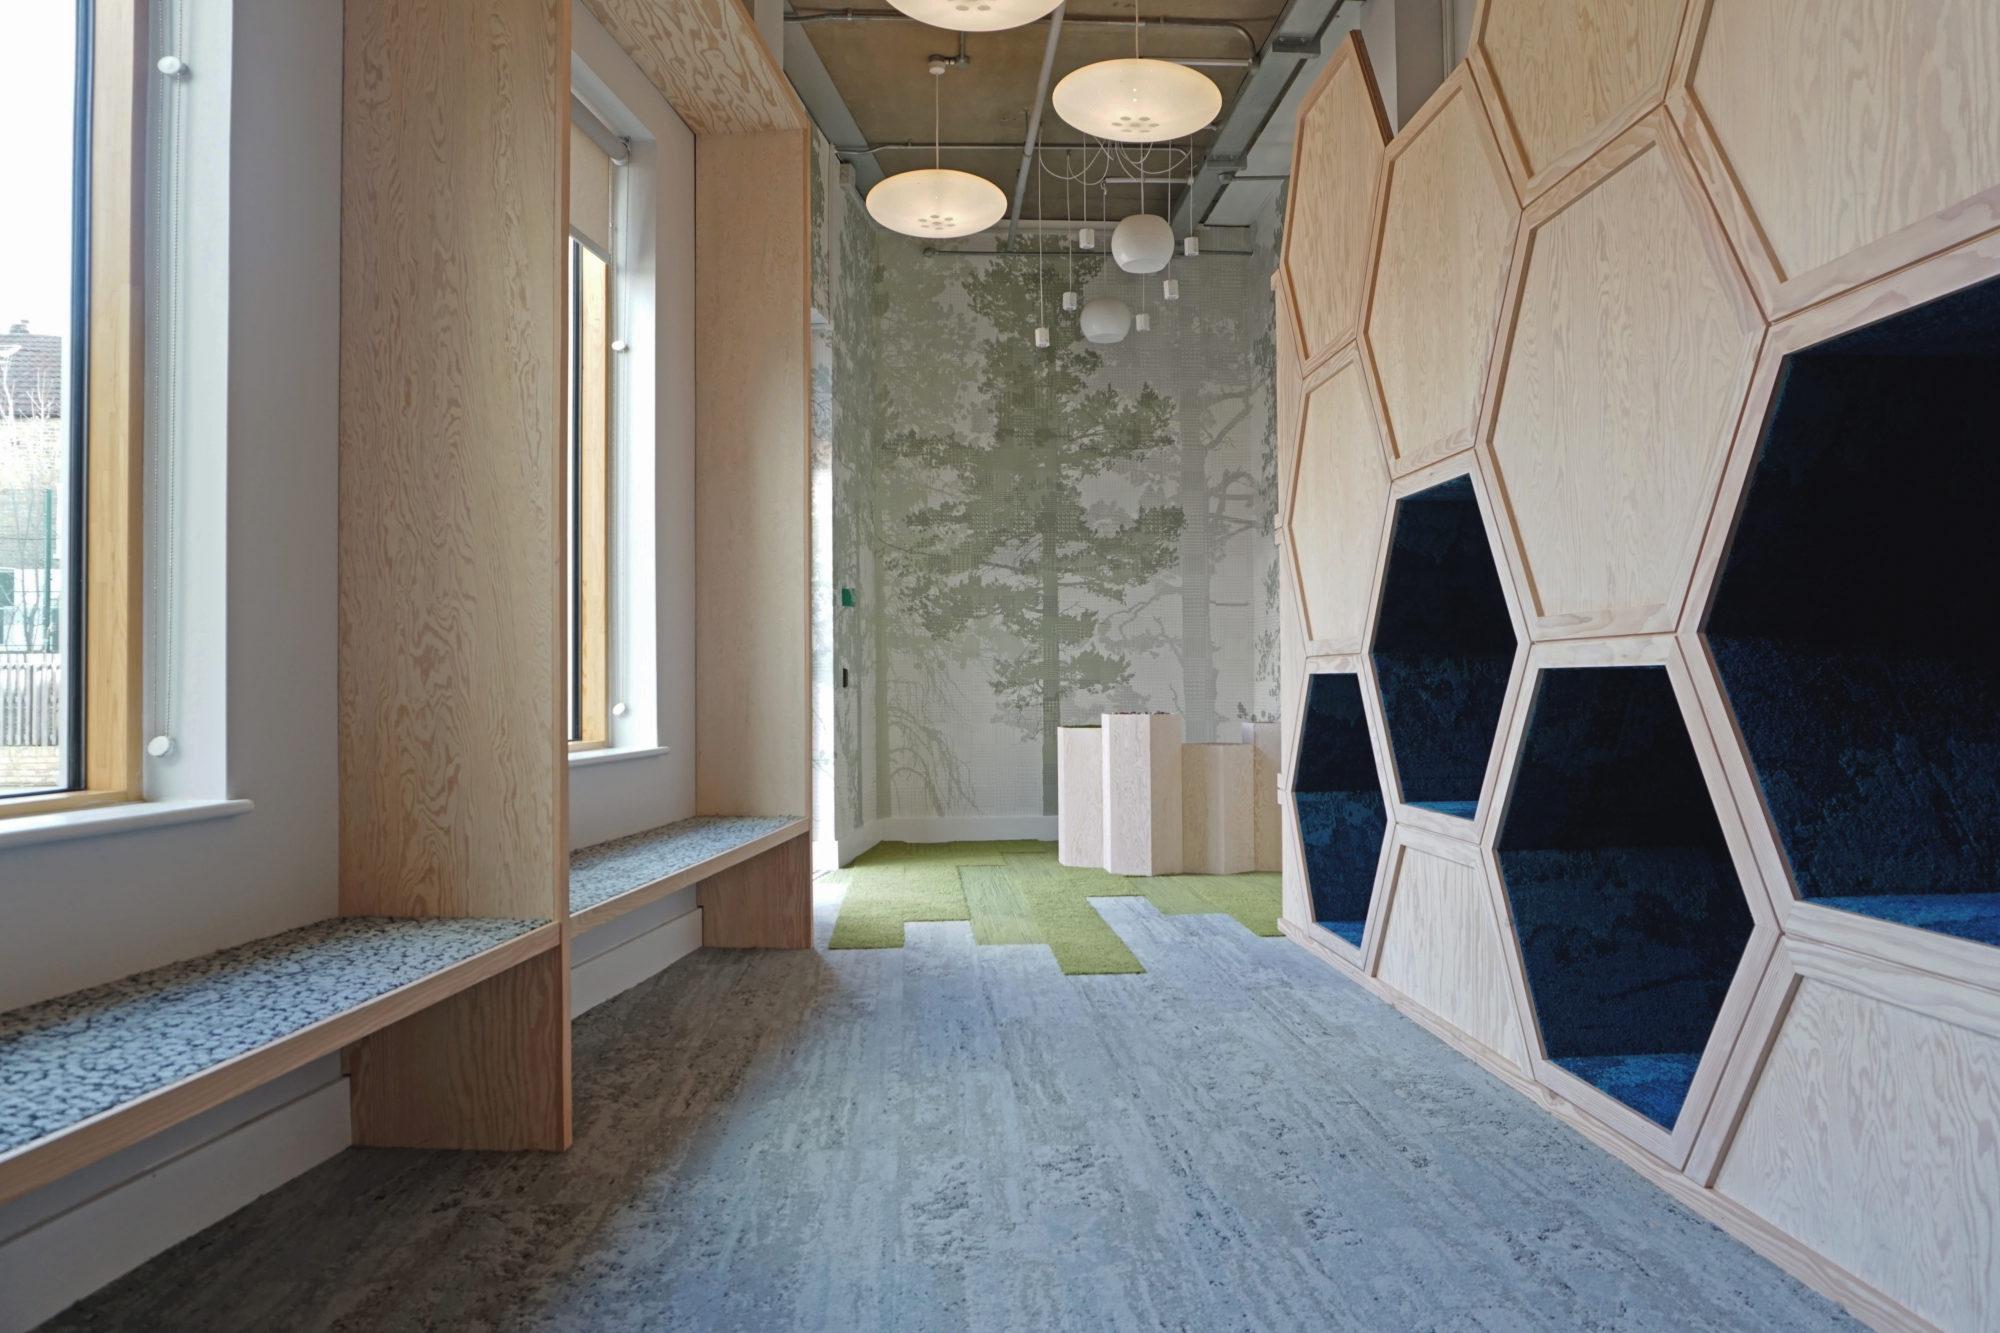 Biophilia-Based Design Trends